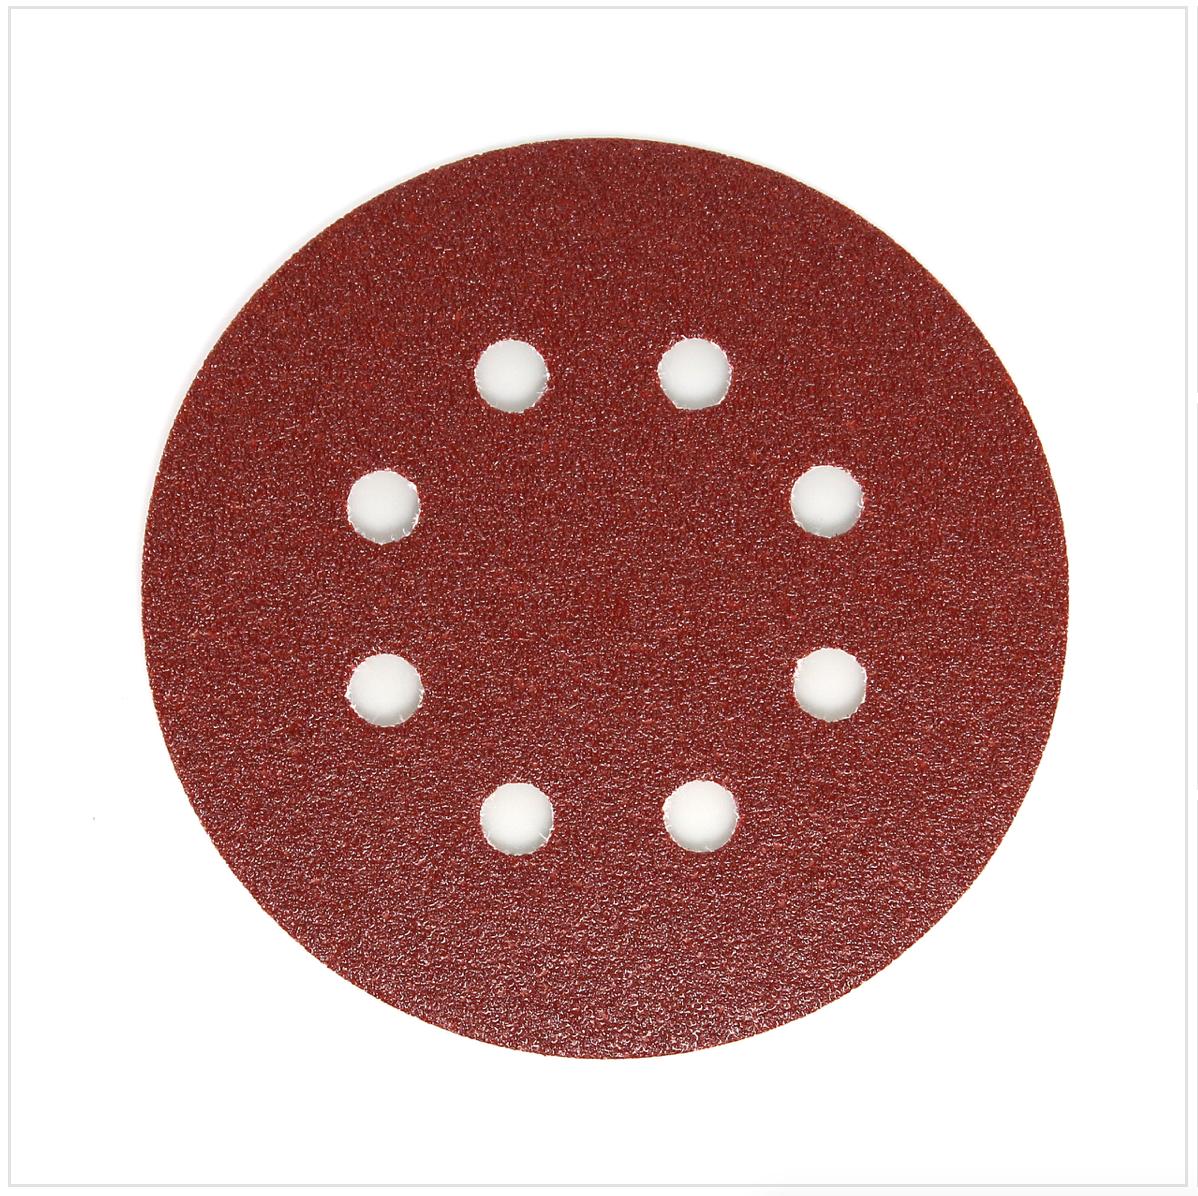 makita schleifpapier 125 mm k rnung 80 klett befestigung f r exzenterschleifer 10er pack p. Black Bedroom Furniture Sets. Home Design Ideas